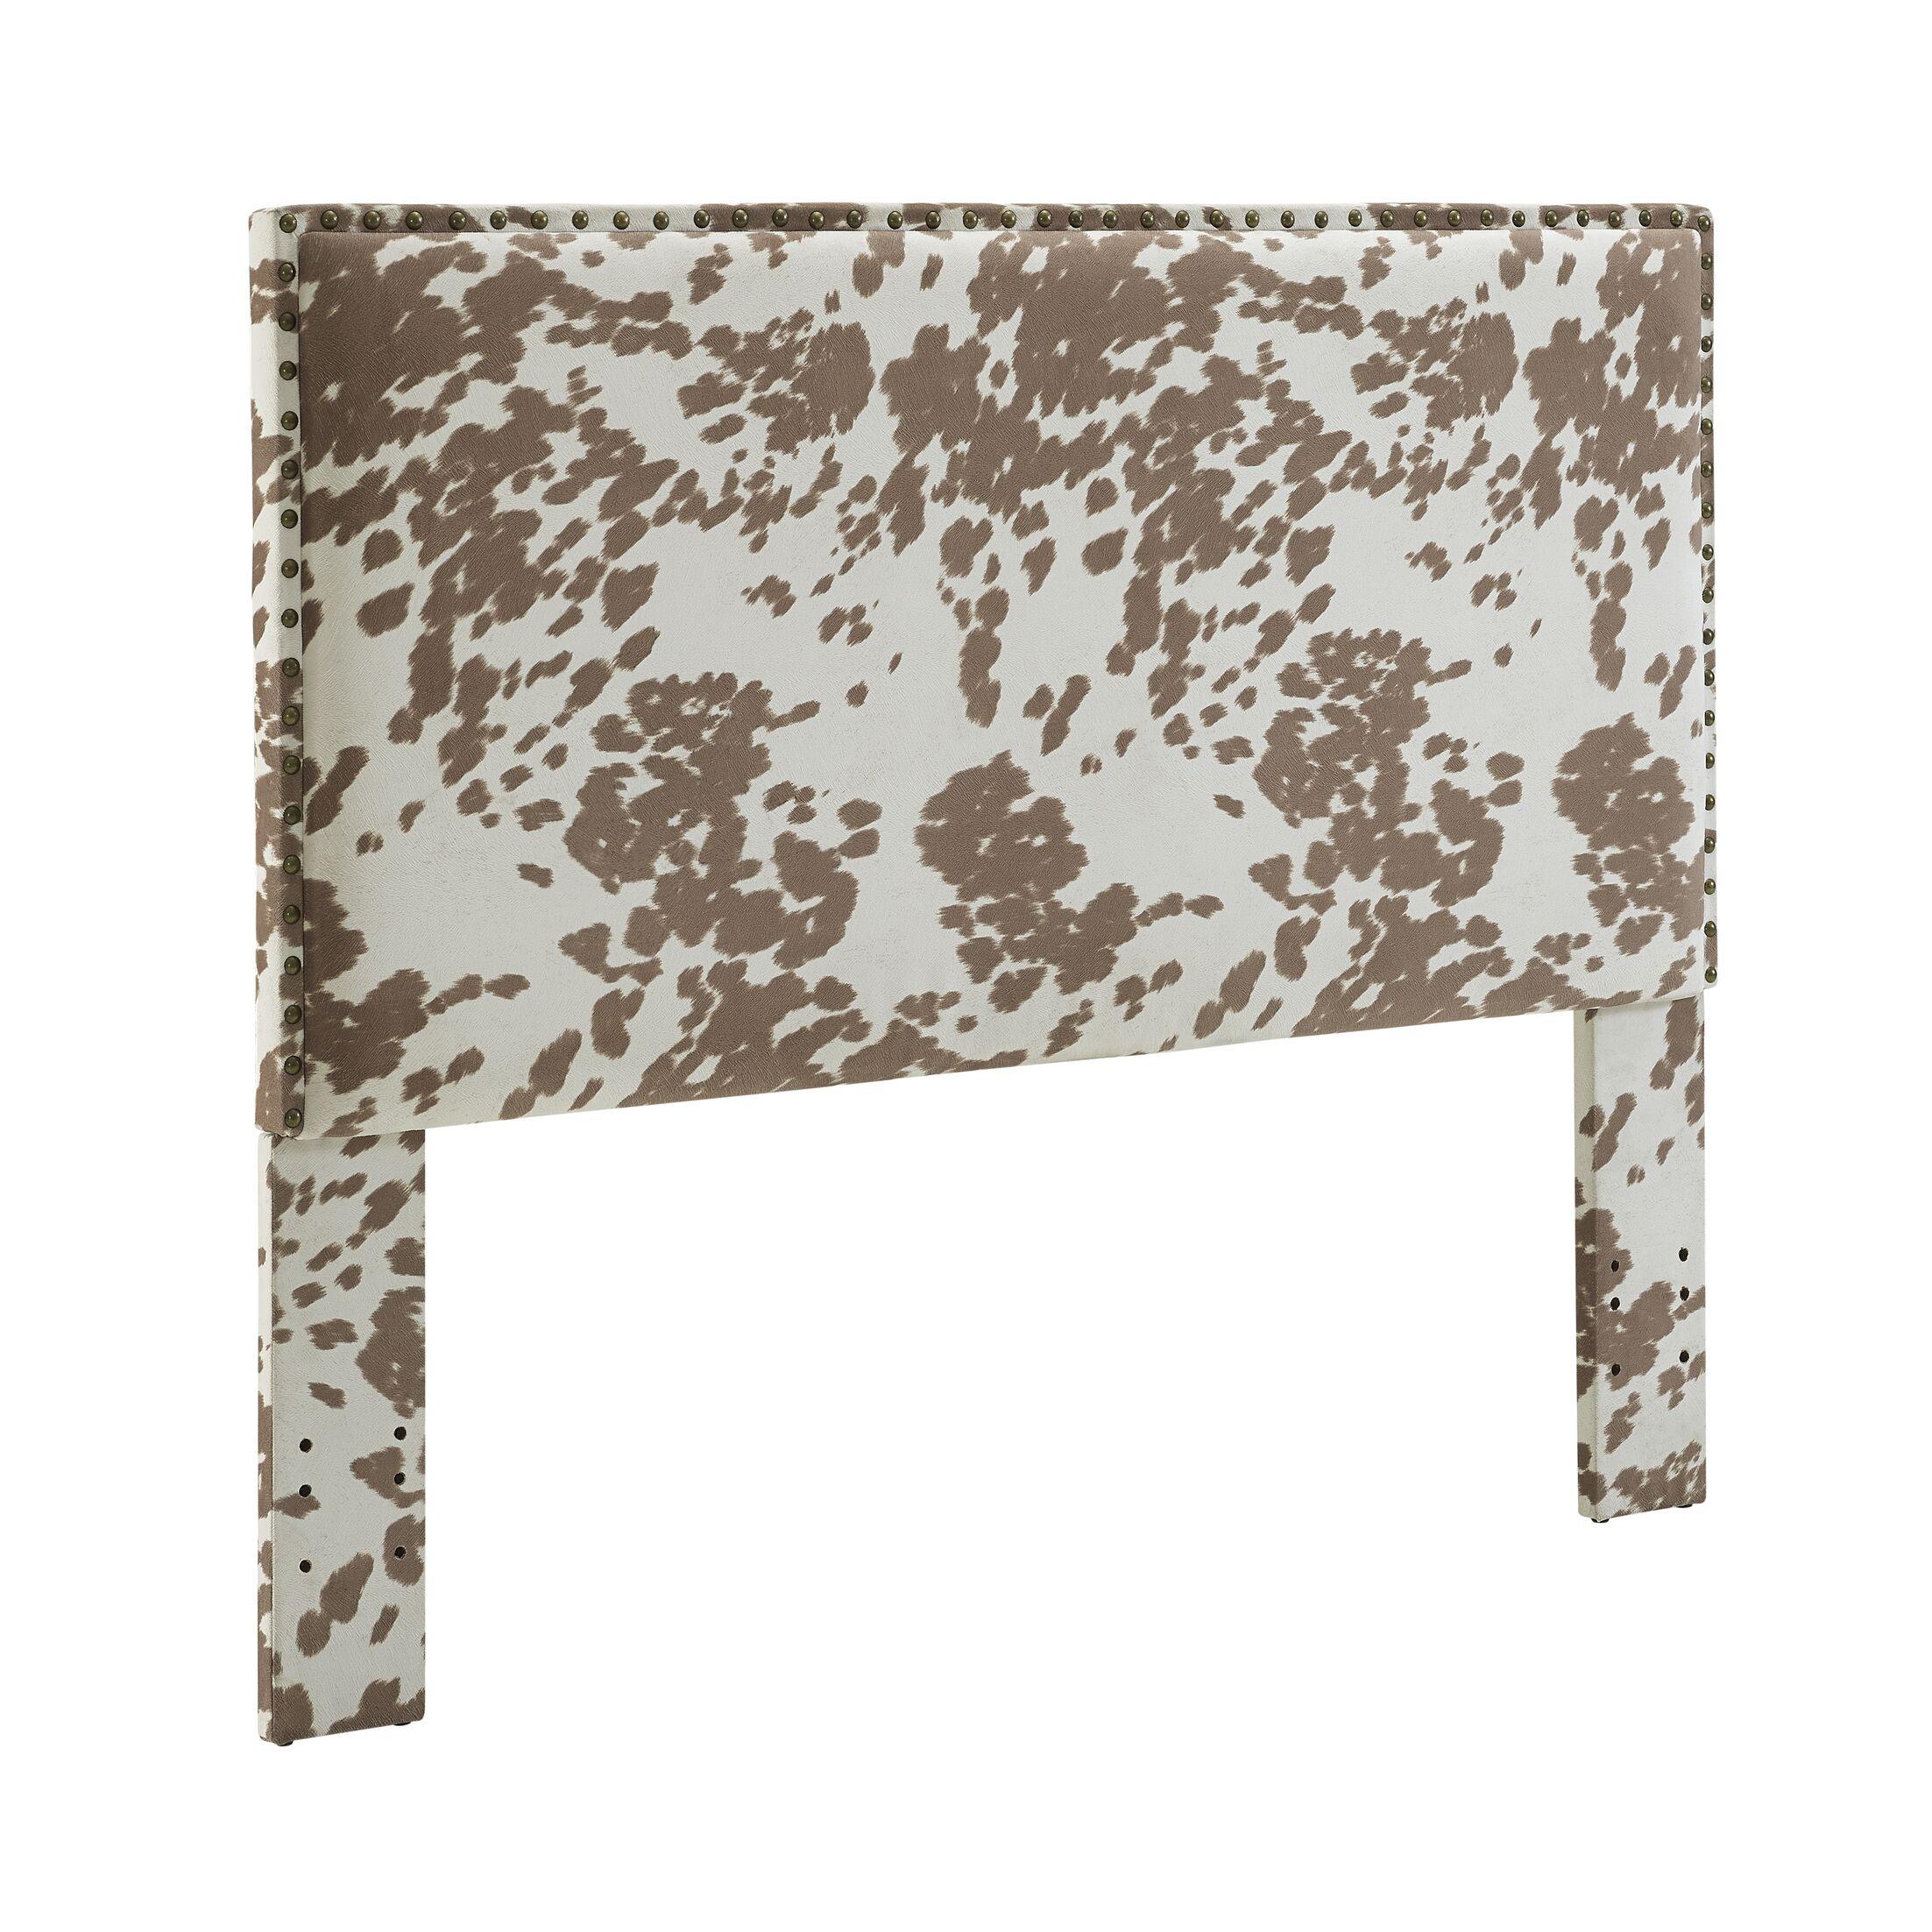 Adison Simple Chic Upholstered Panel Headboard